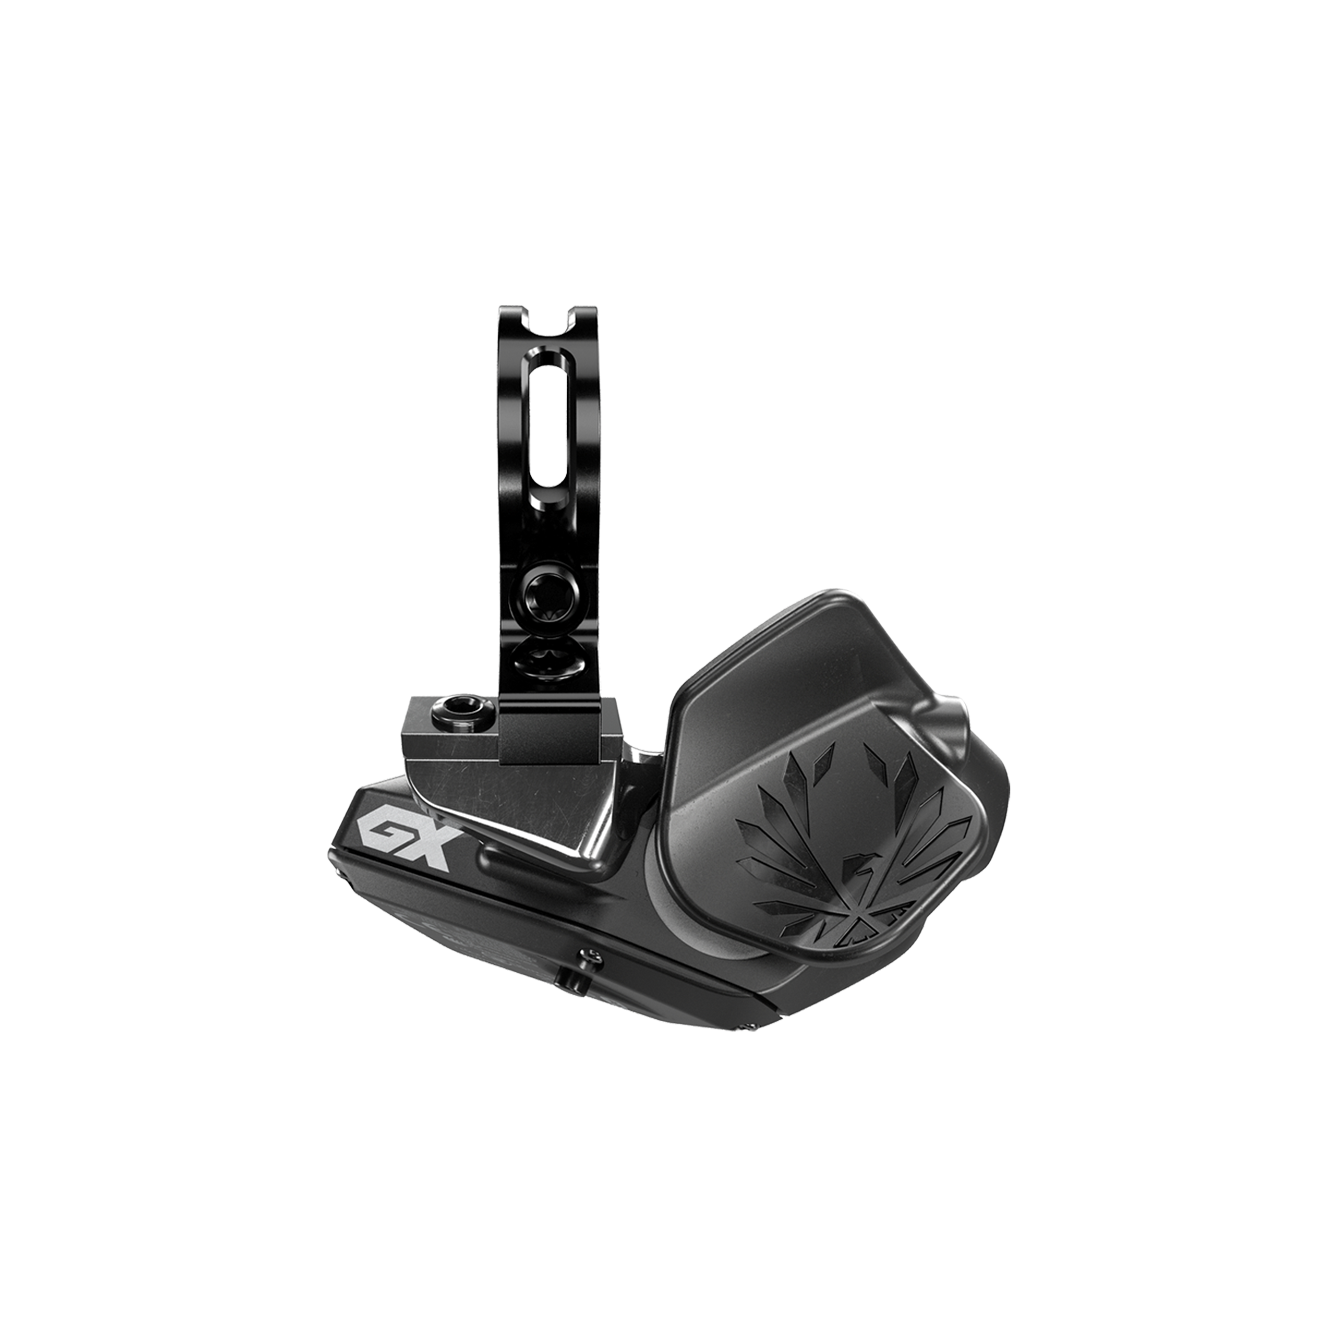 SRAM GX Eagle AXS Two Button Right Hand Shift Lever-1